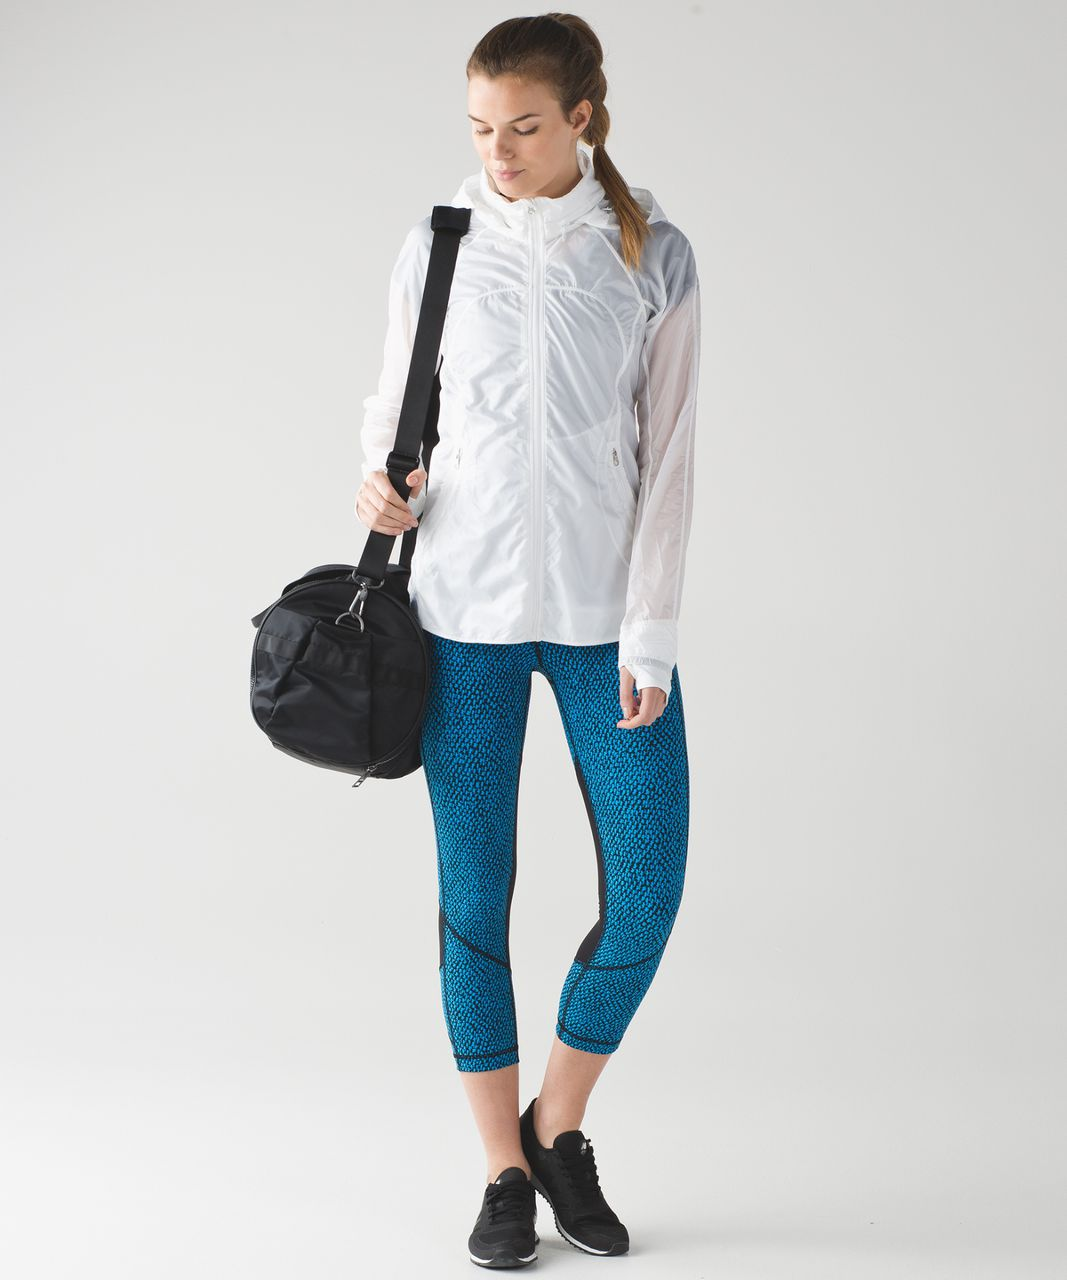 Lululemon Pace Rival Crop - Scatter Star Beach Blanket Blue Black / Black